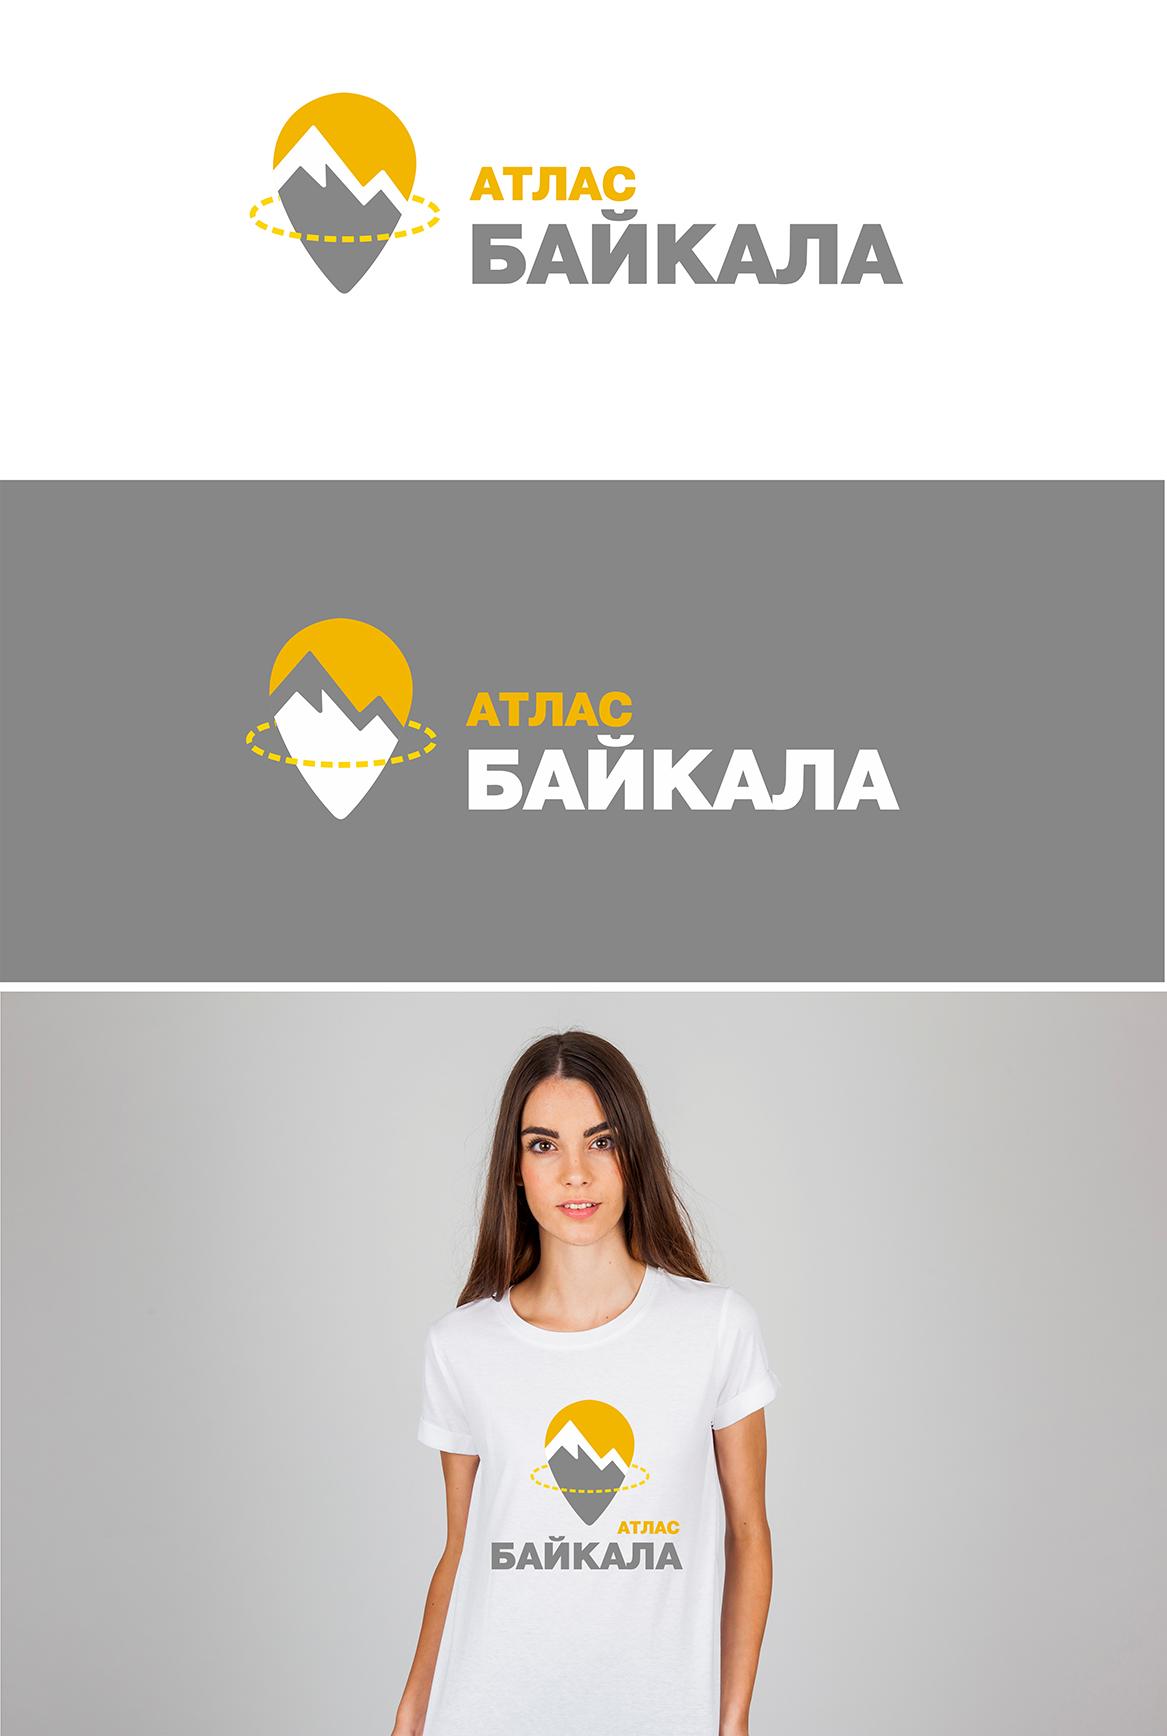 Разработка логотипа Атлас Байкала фото f_0895b16cd7f787f7.jpg